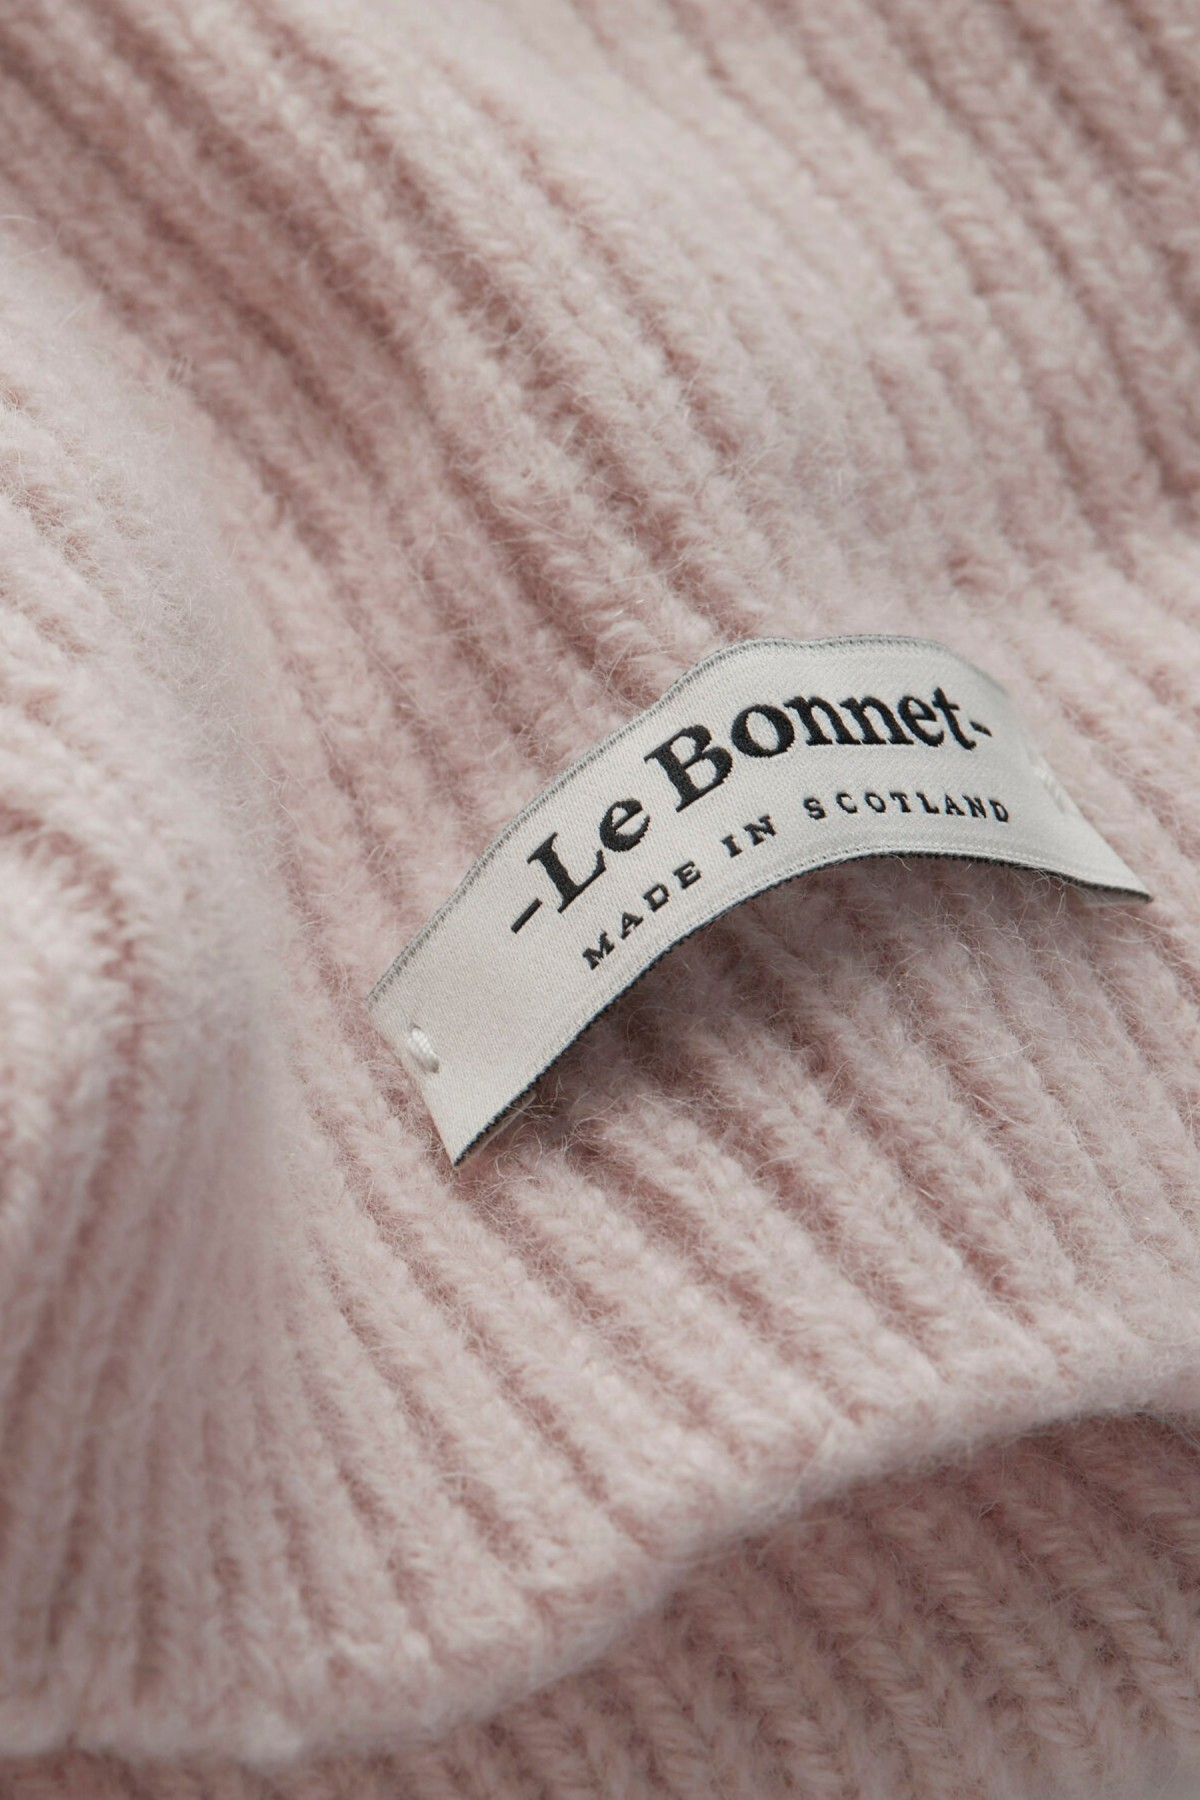 LeBonnet Beanie in MistyRose